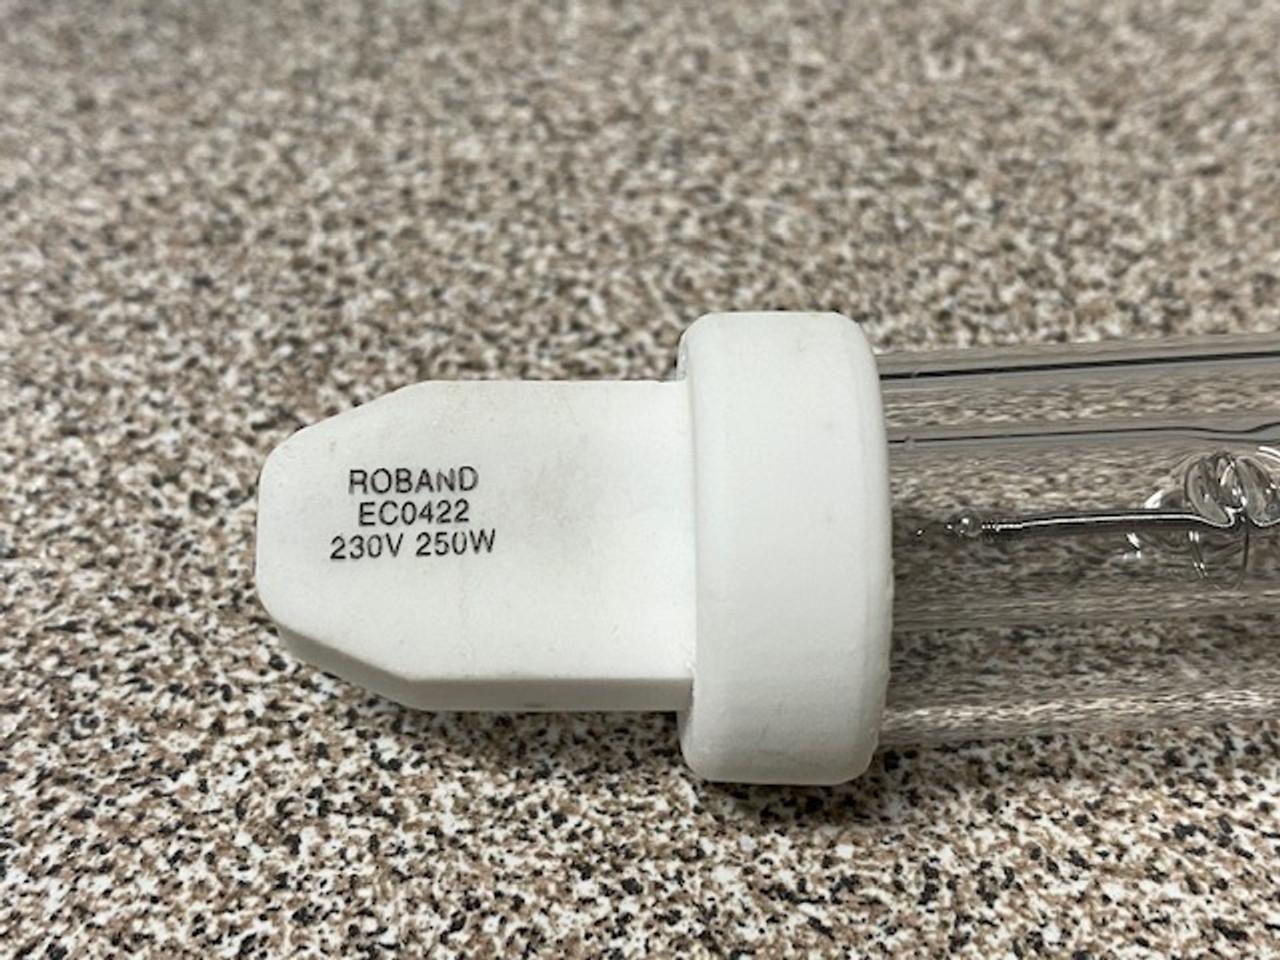 Roband EC0422 heat lamp globe - P0013